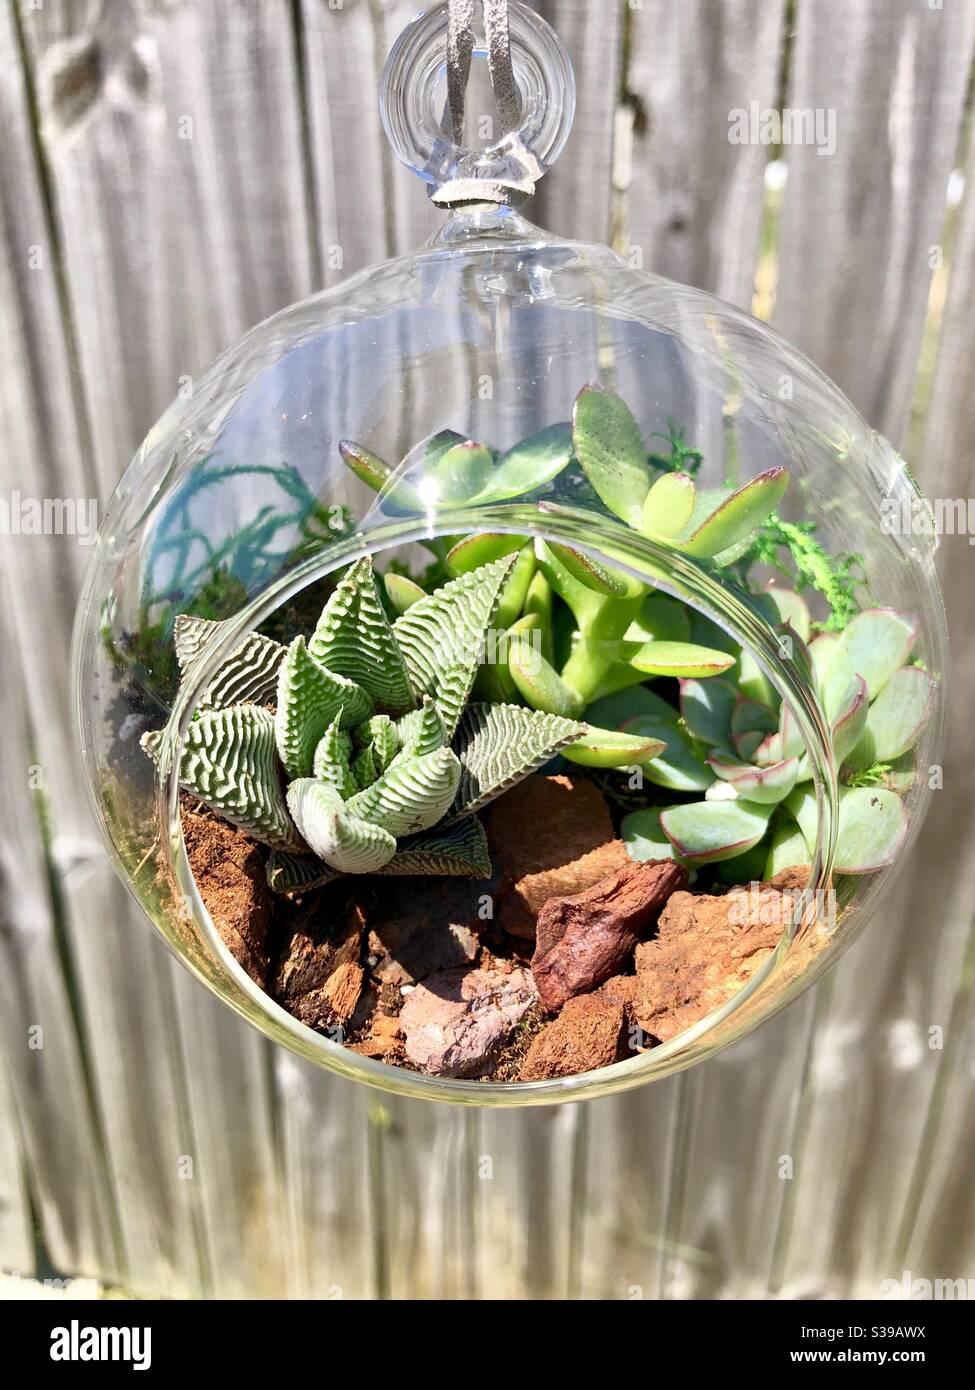 Succulents In A Hanging Terrarium Stock Photo Alamy